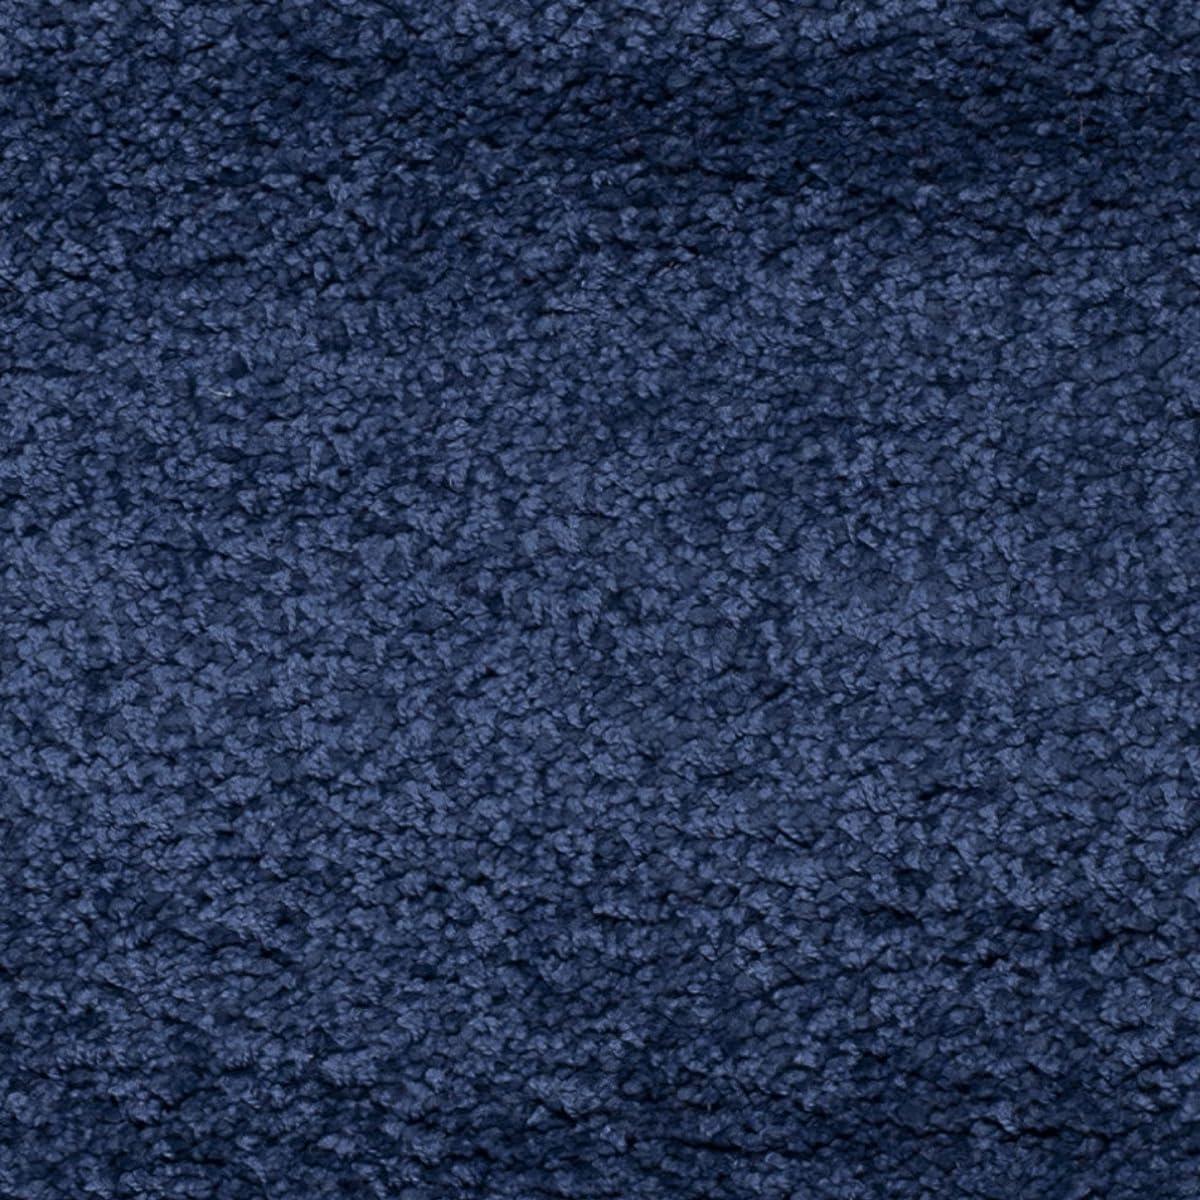 Safavieh Milan Shag Collection SG180-7070 Navy Area Rug (4 x 6)